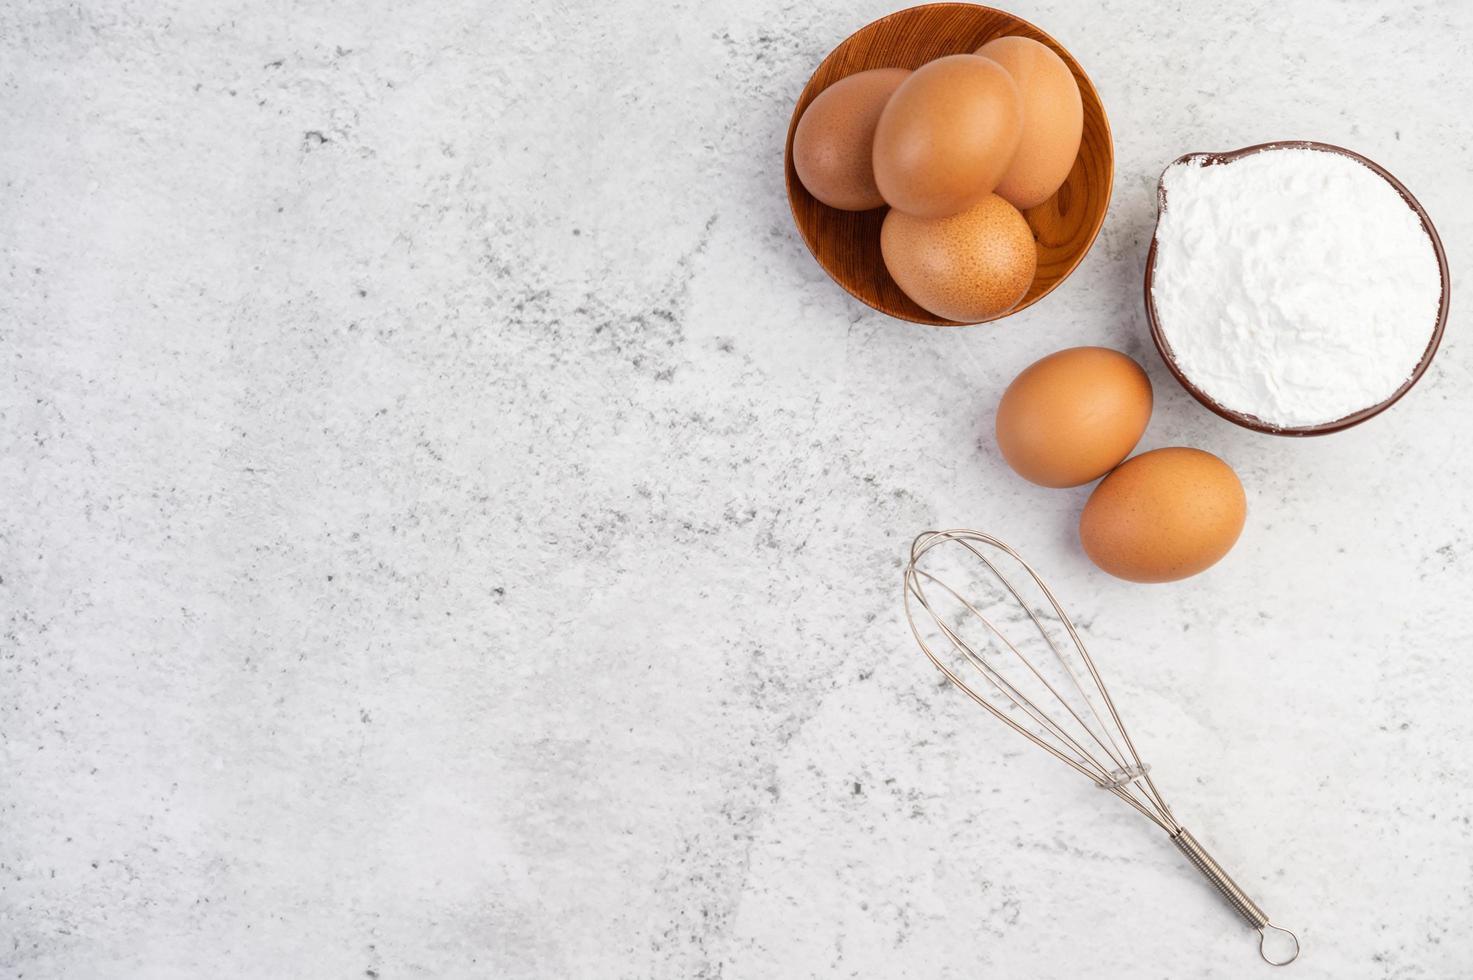 œufs, farine de tapioca et batteur à œufs photo